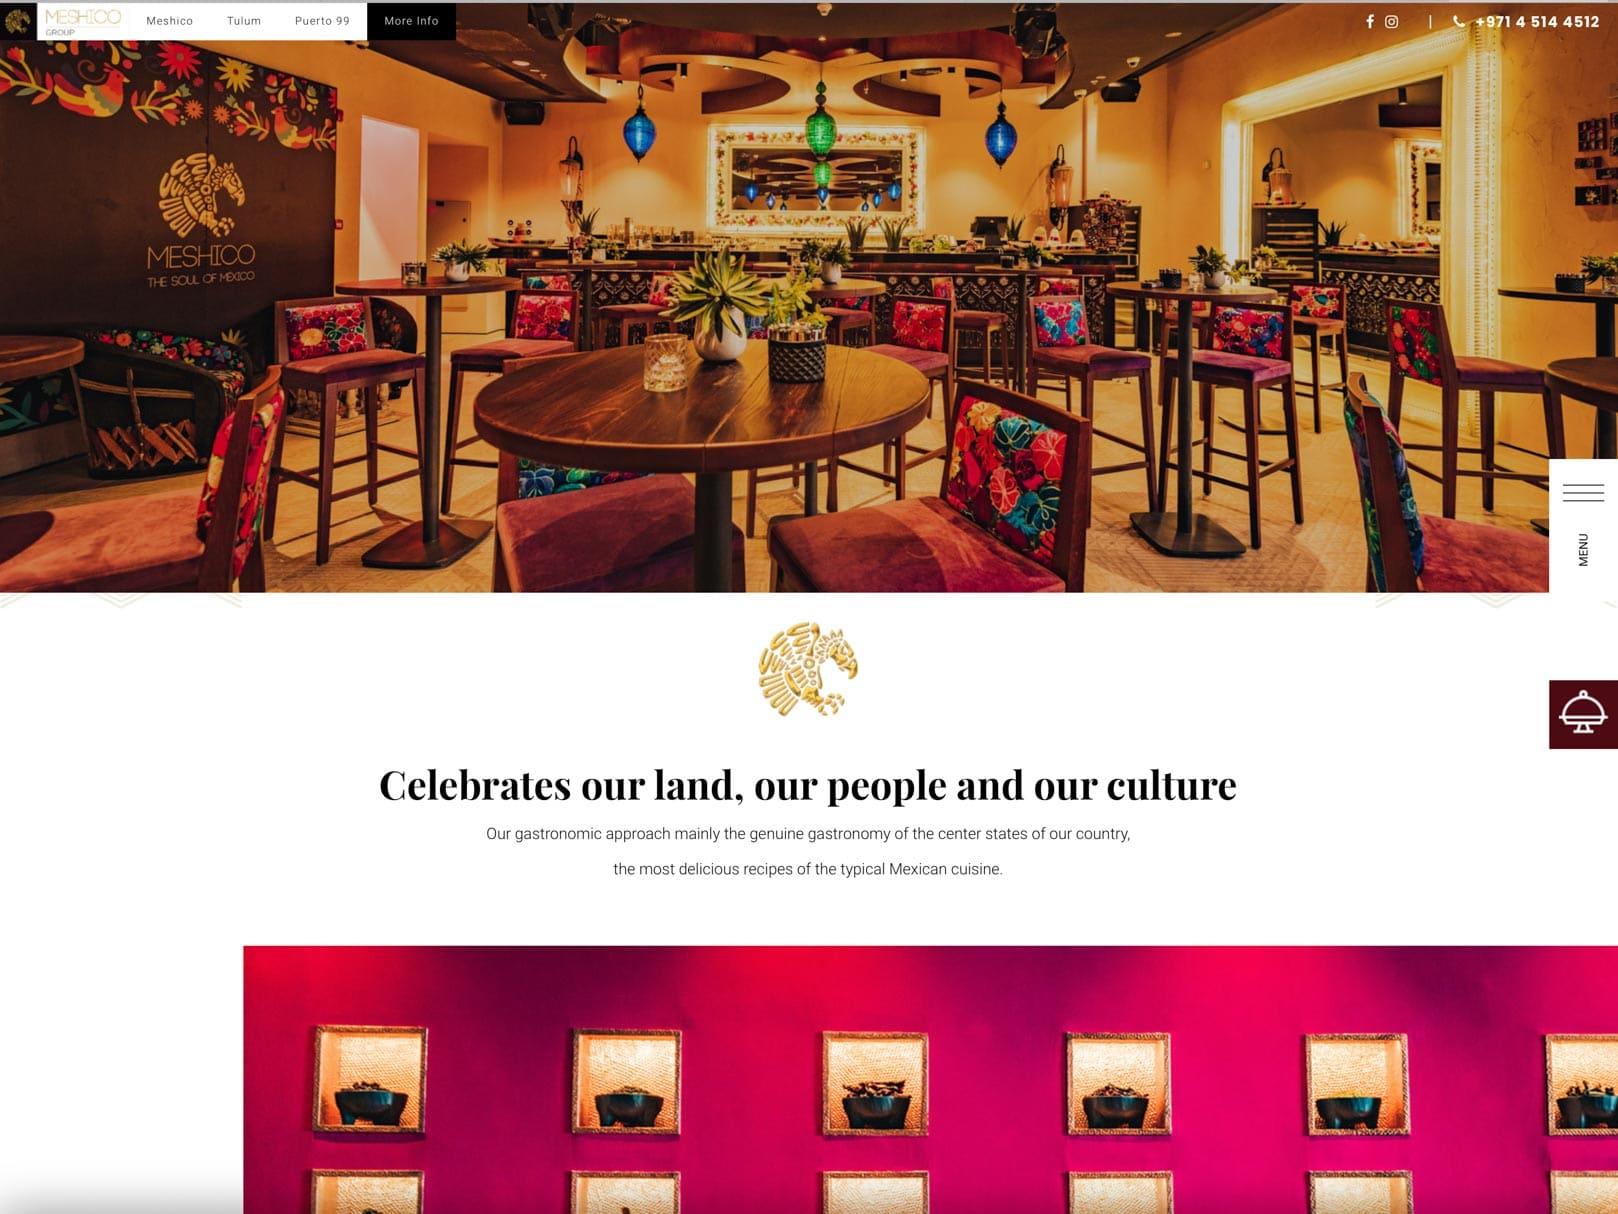 Meshico Dubai Publicity